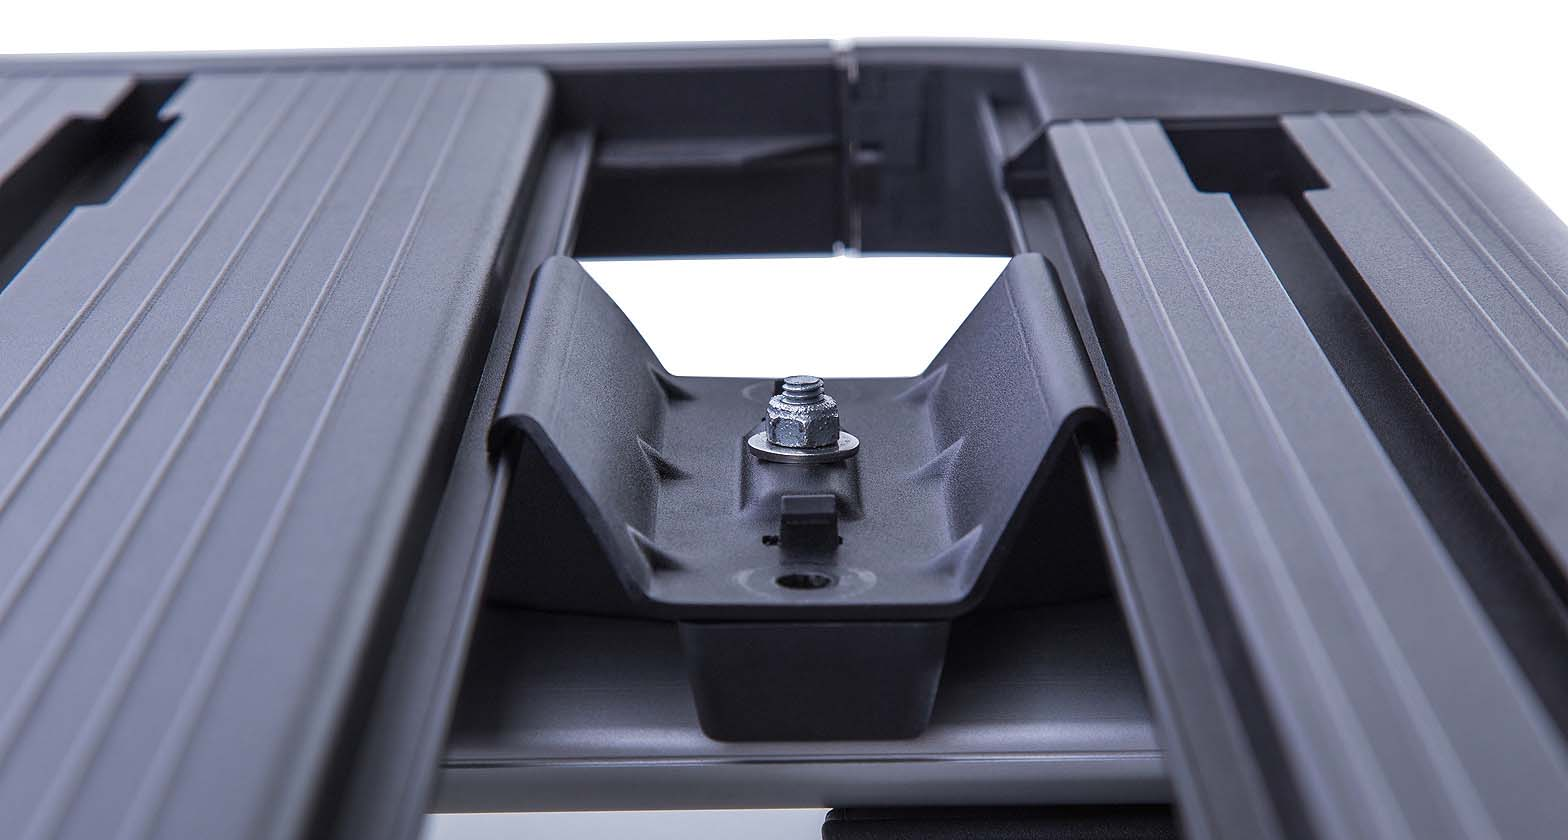 RhinoRack Pioneer Platform Universal Unassembled Small ライノラック パイオニアプラットフォーム 組立て式 スモール 1228mm x 952mm